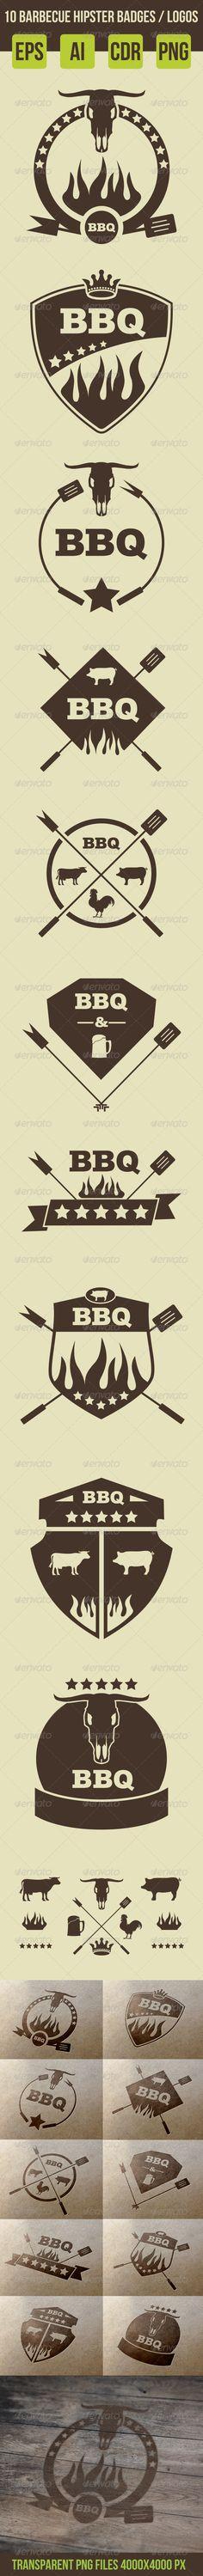 10 Barbeque Hipster Vector Emblems Vol.2  For download - http://graphicriver.net/item/10-barbeque-hipster-vector-emblems-vol2-/8063661?WT.ac=portfolioWT.z_author=ragerabbit